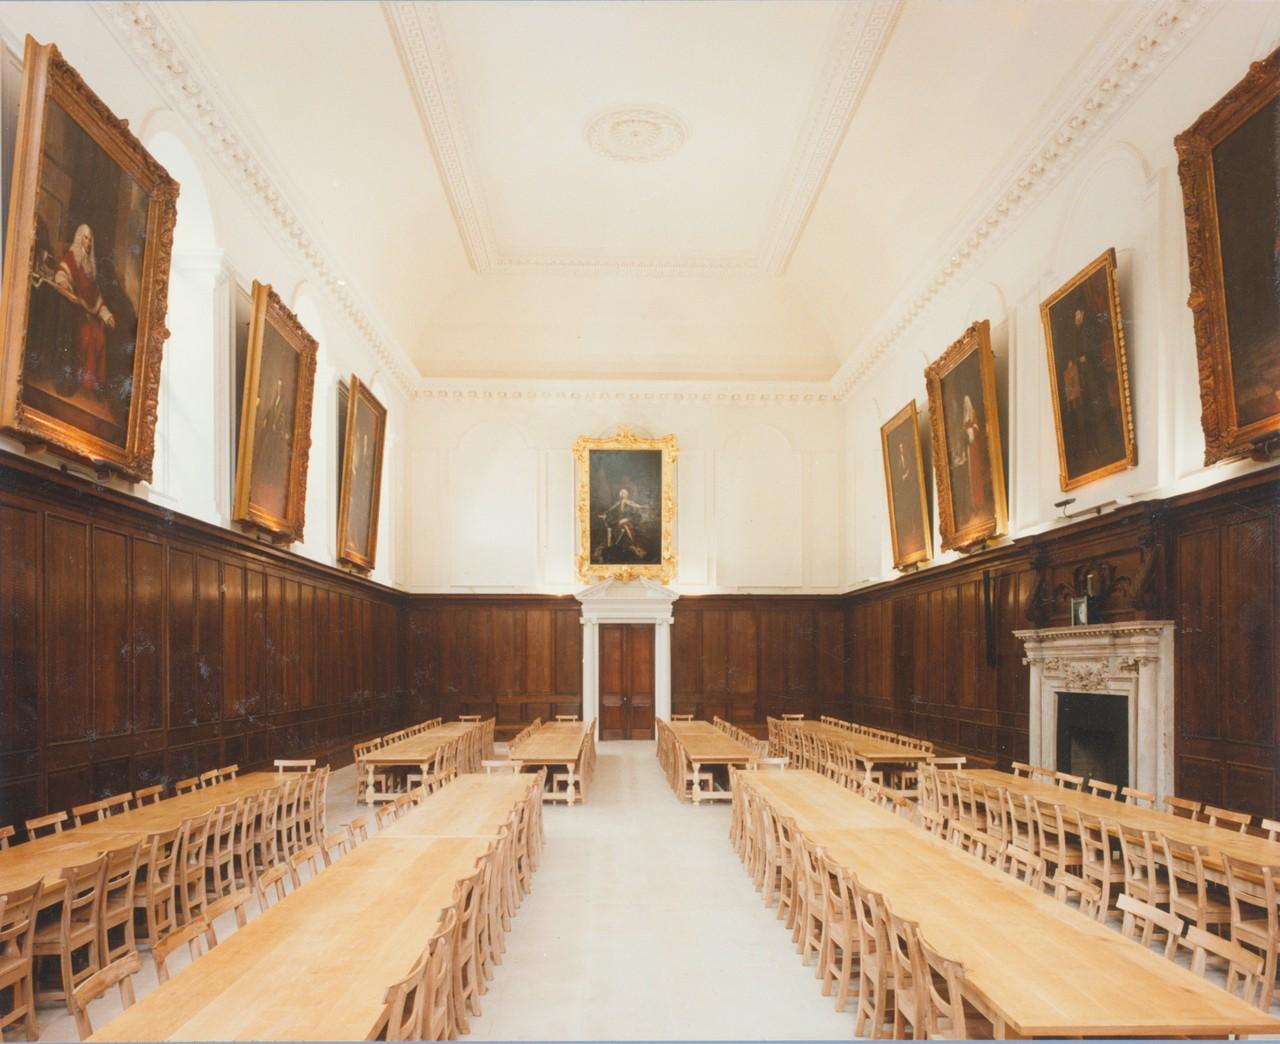 Trinity College, Dublin, Dining Hall interior after restoration